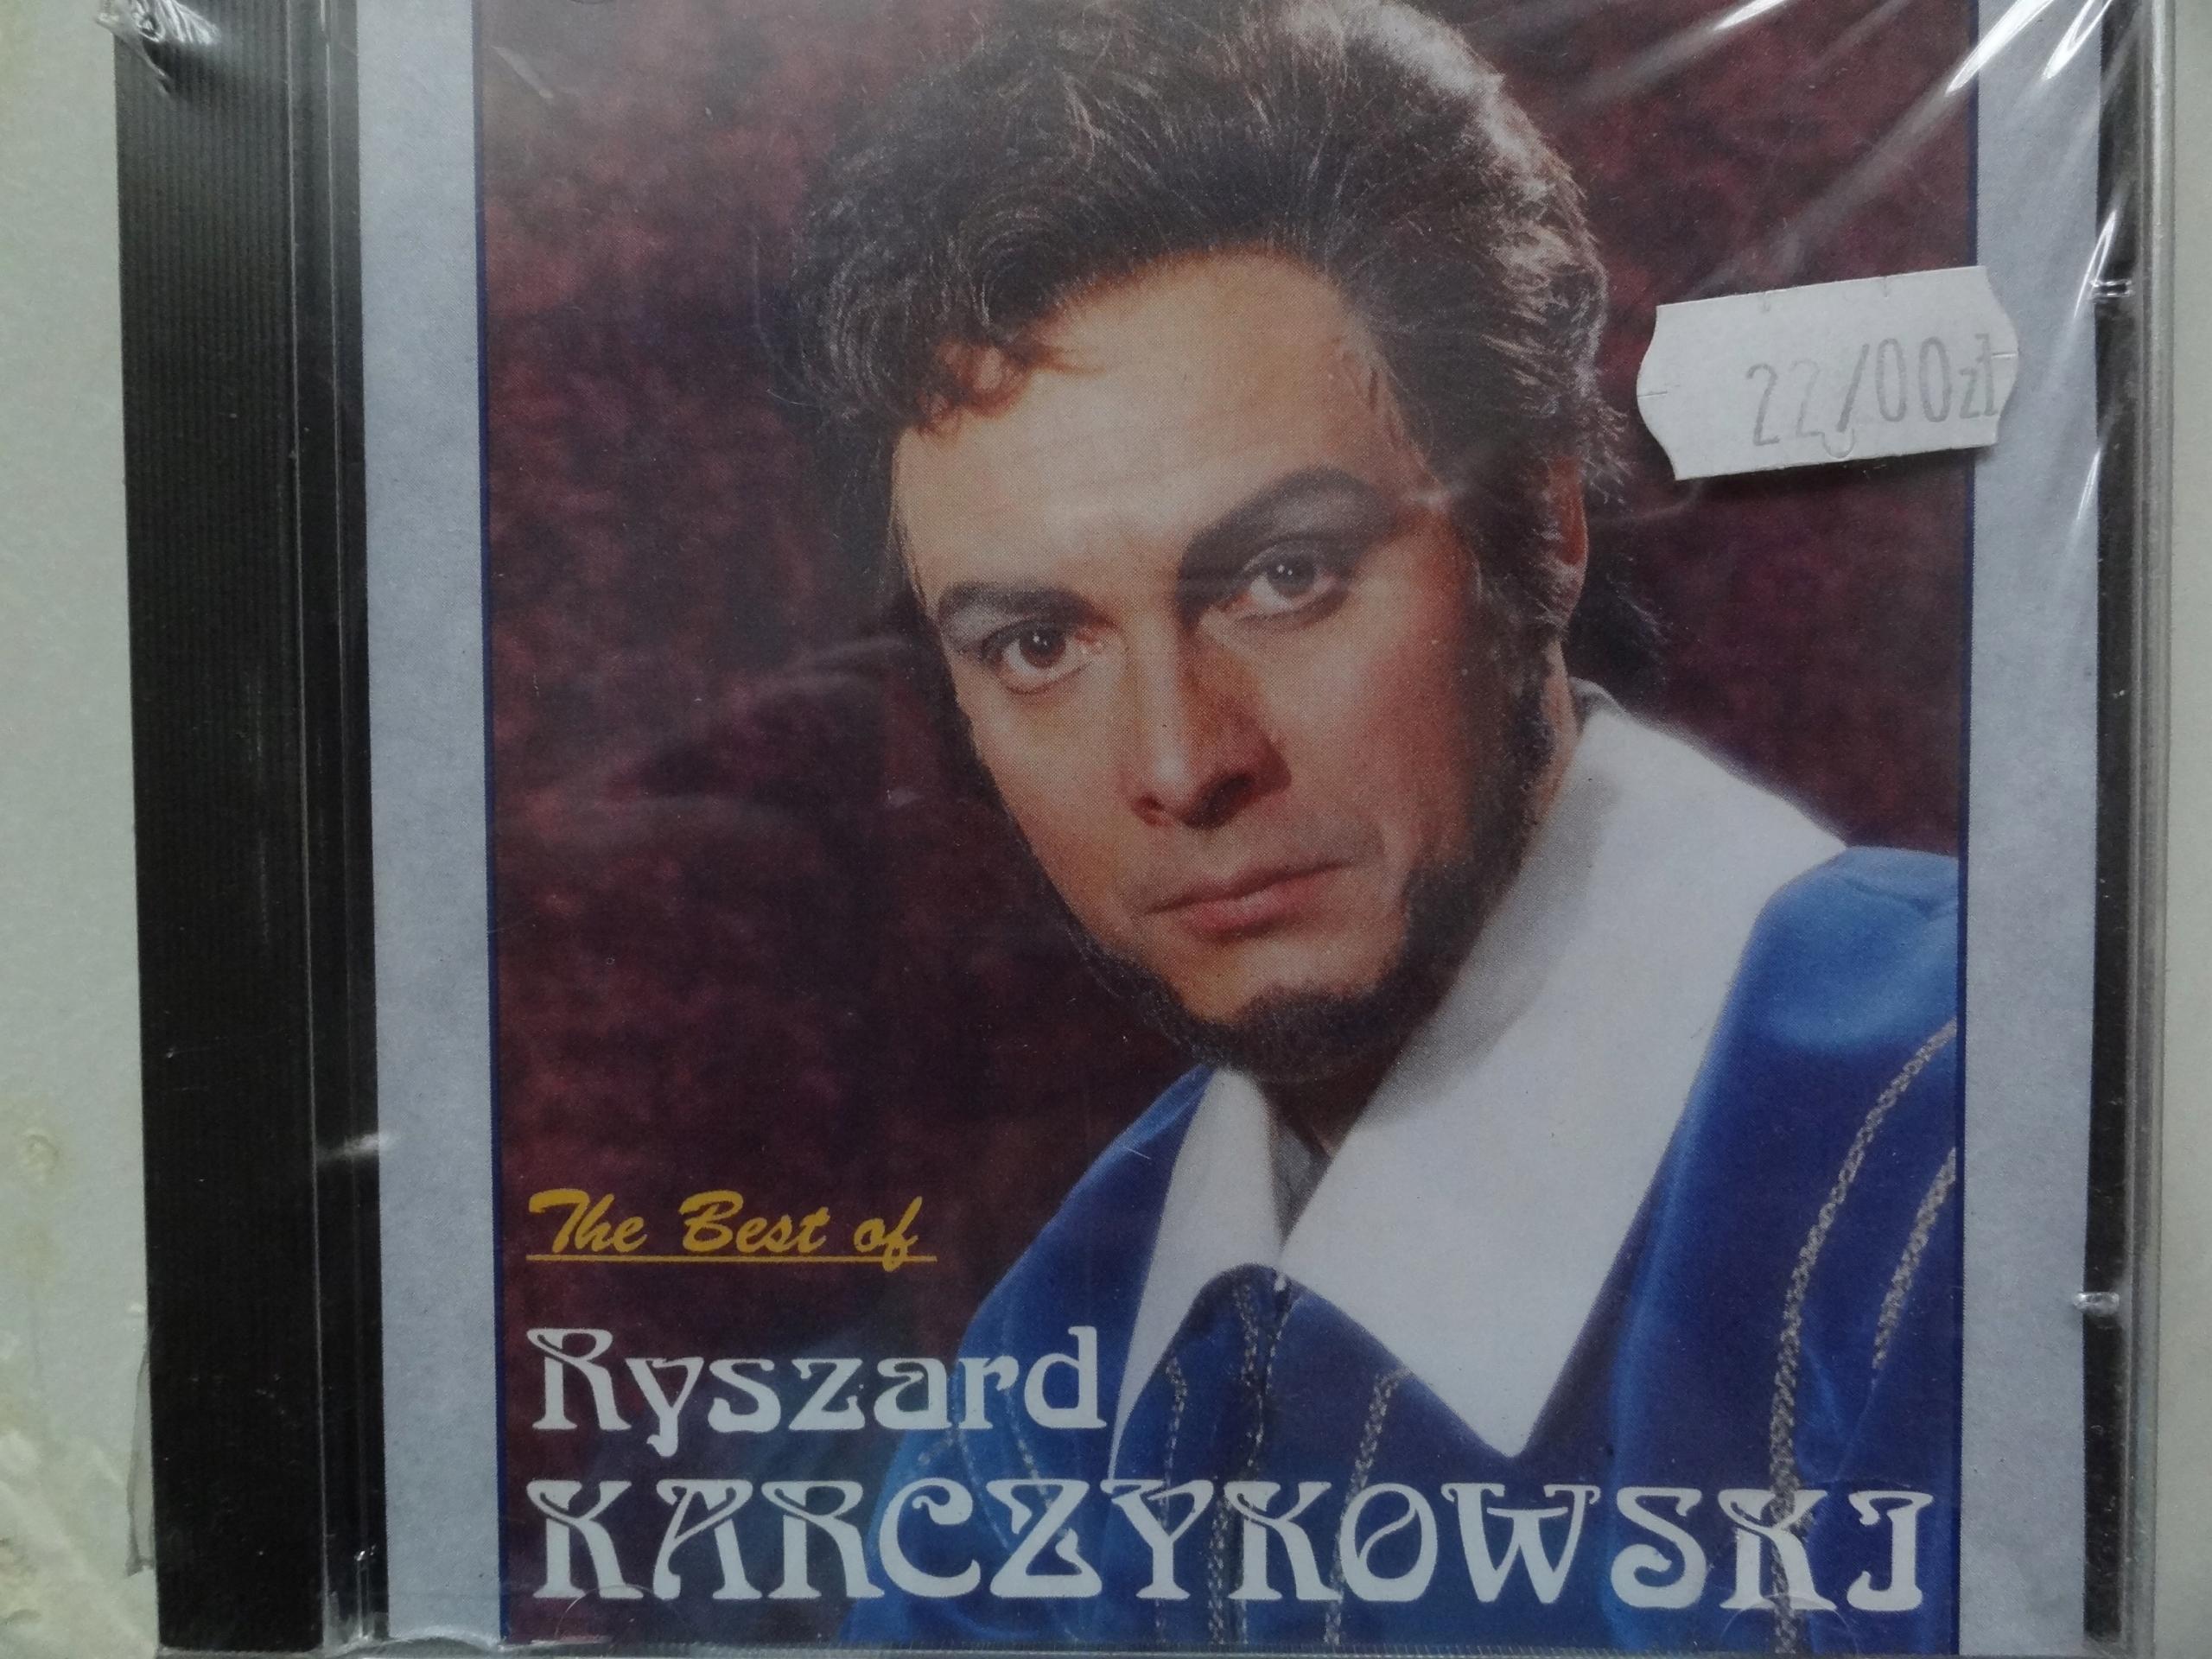 Ryszard Karczykowski - The best of